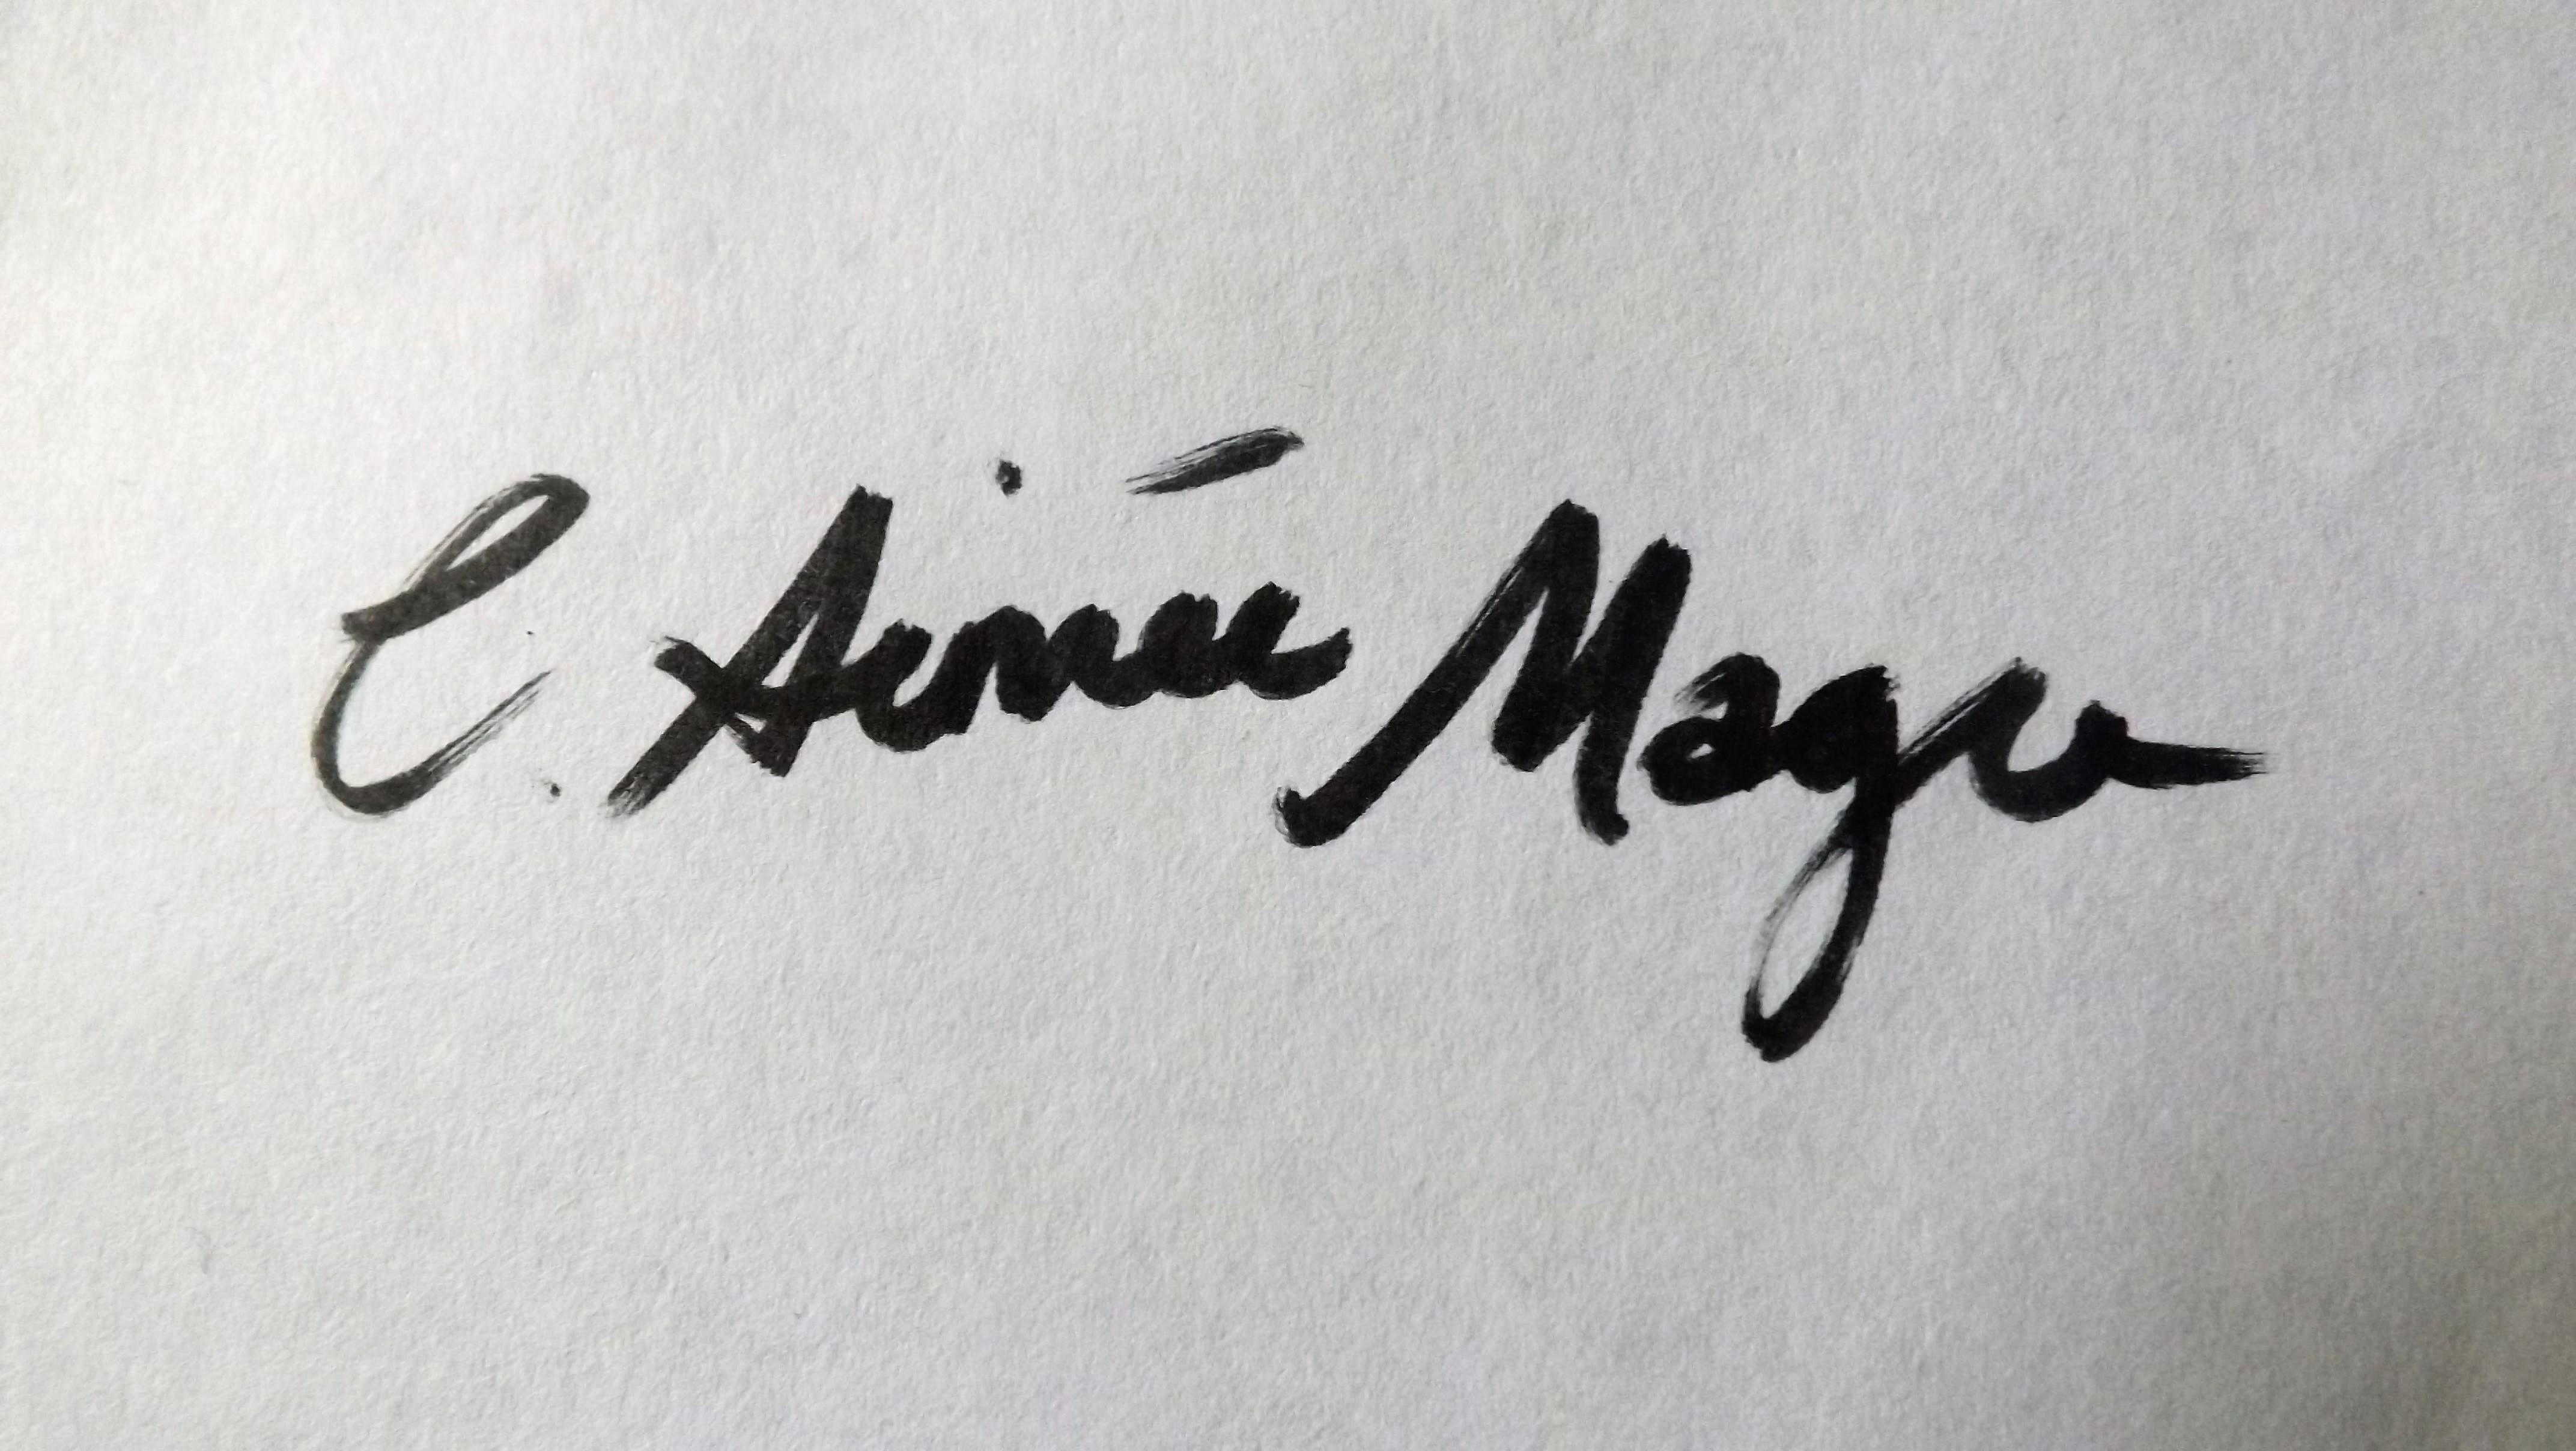 Catherine Aimee Magee Signature